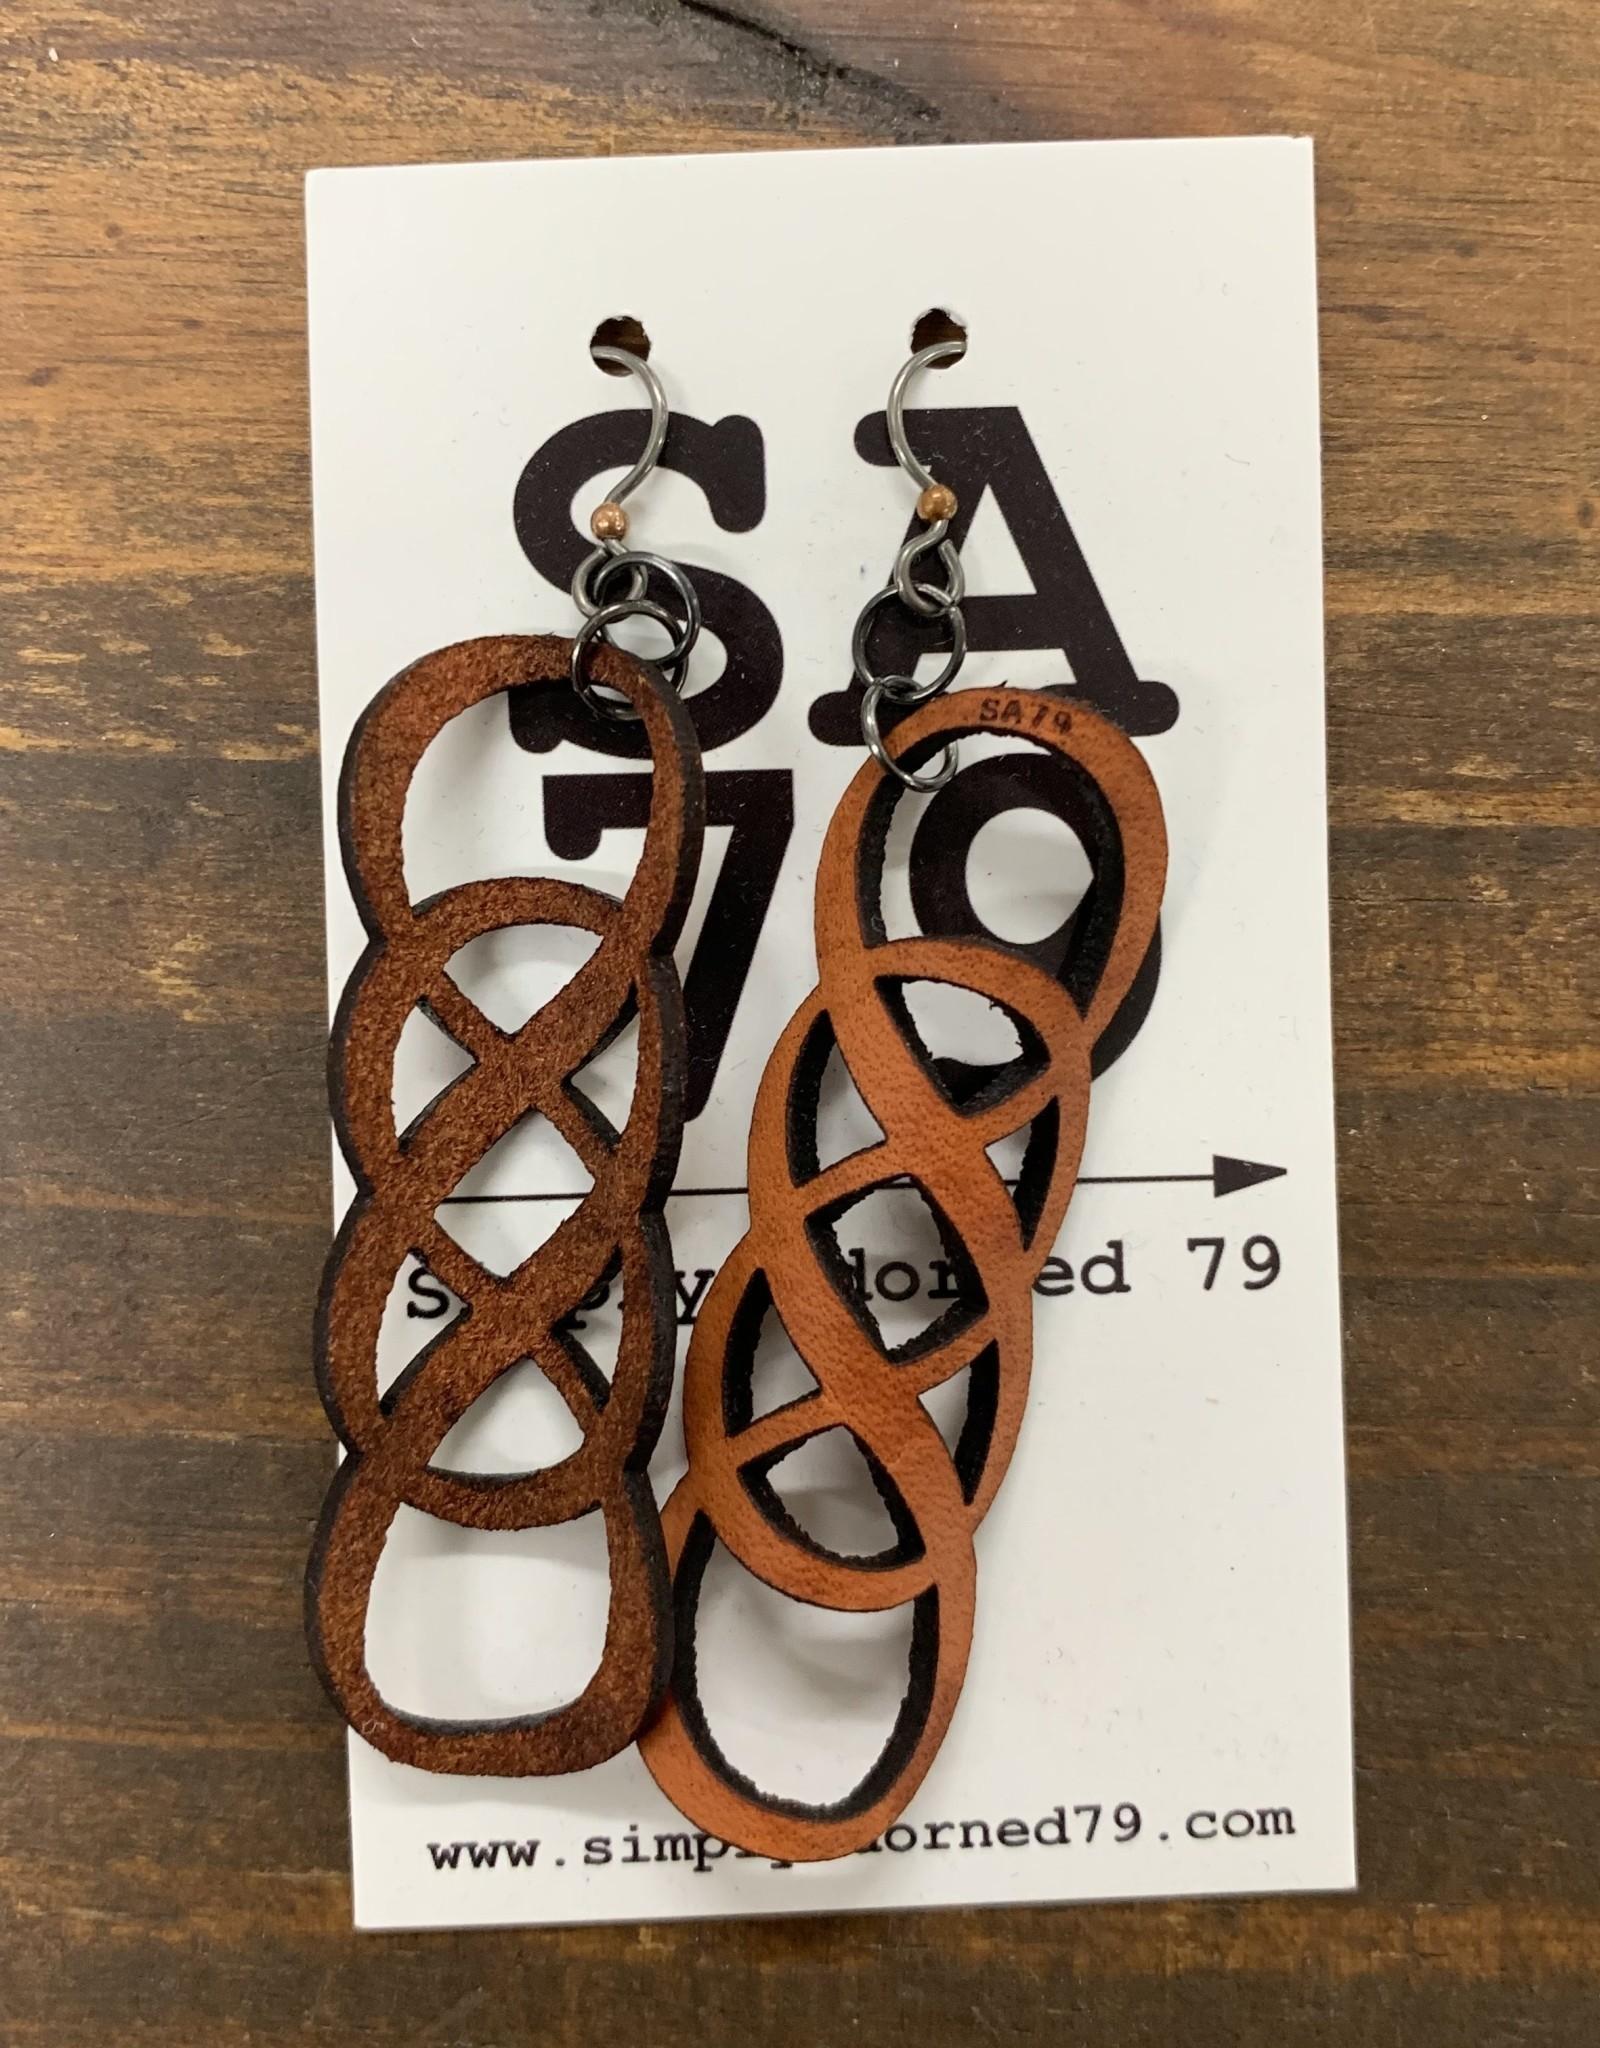 SA79 - THE INFINITY- ORANGE EARRING